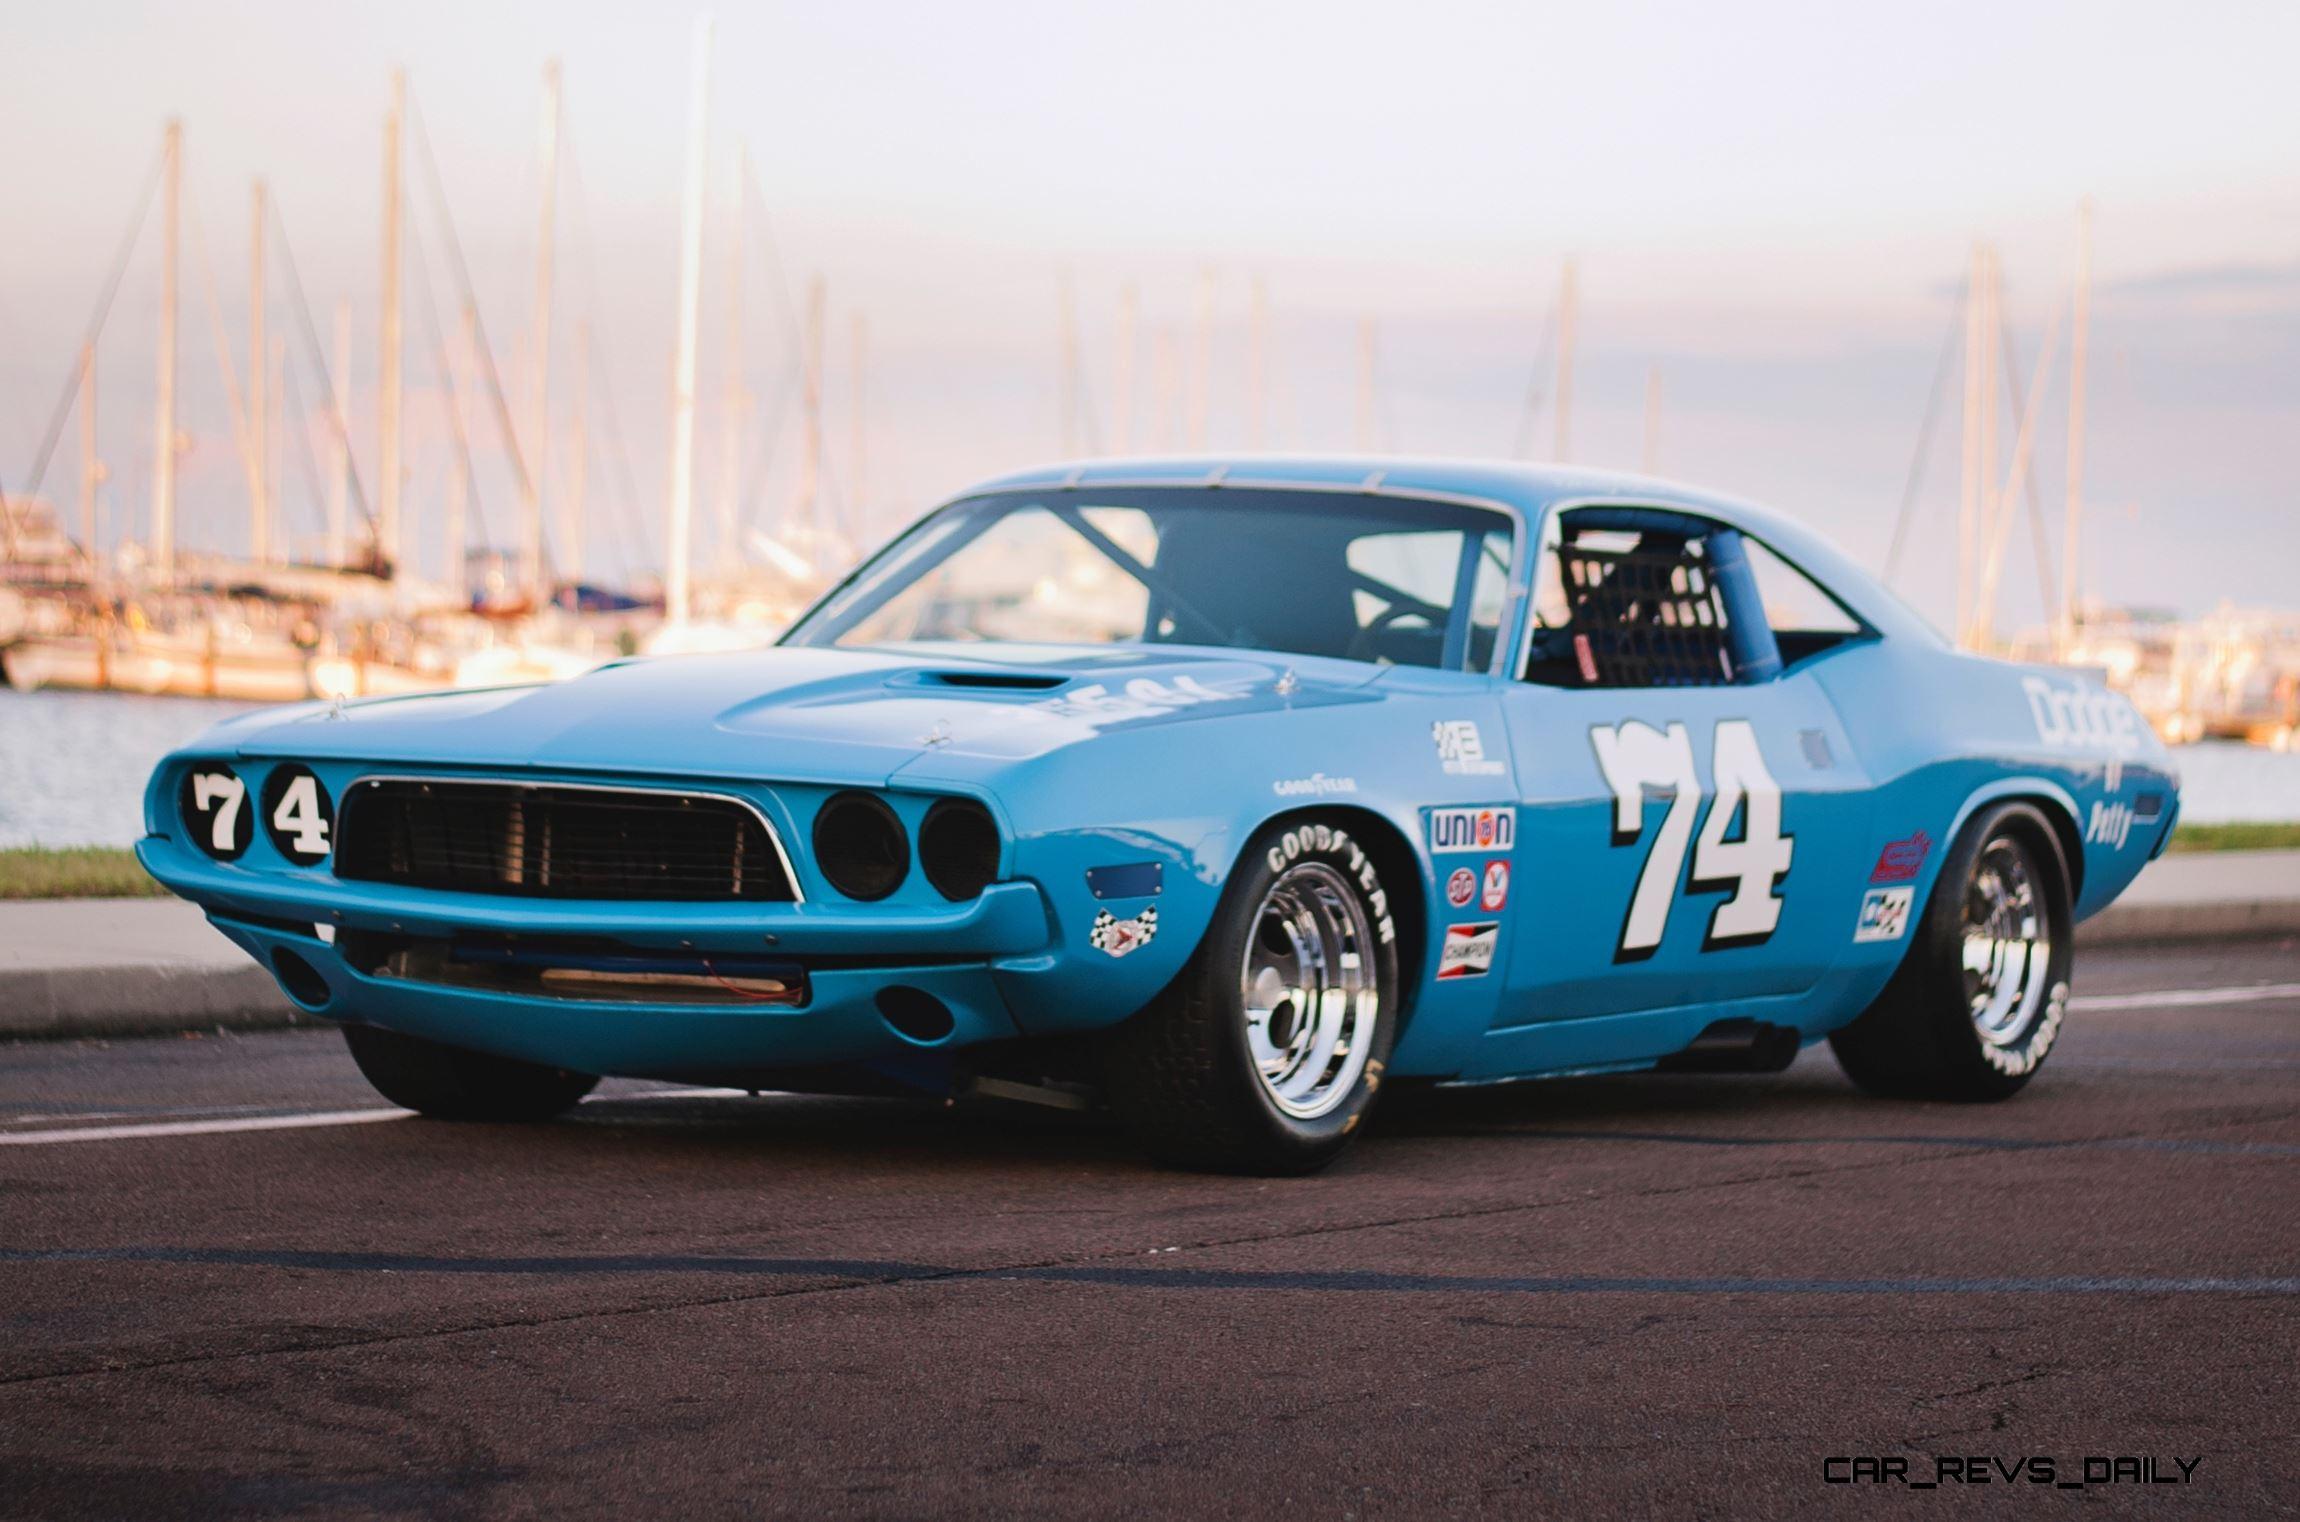 1973 Dodge Challenger Race Car - Ex-Dale Earnhardt - Saturday Night ...